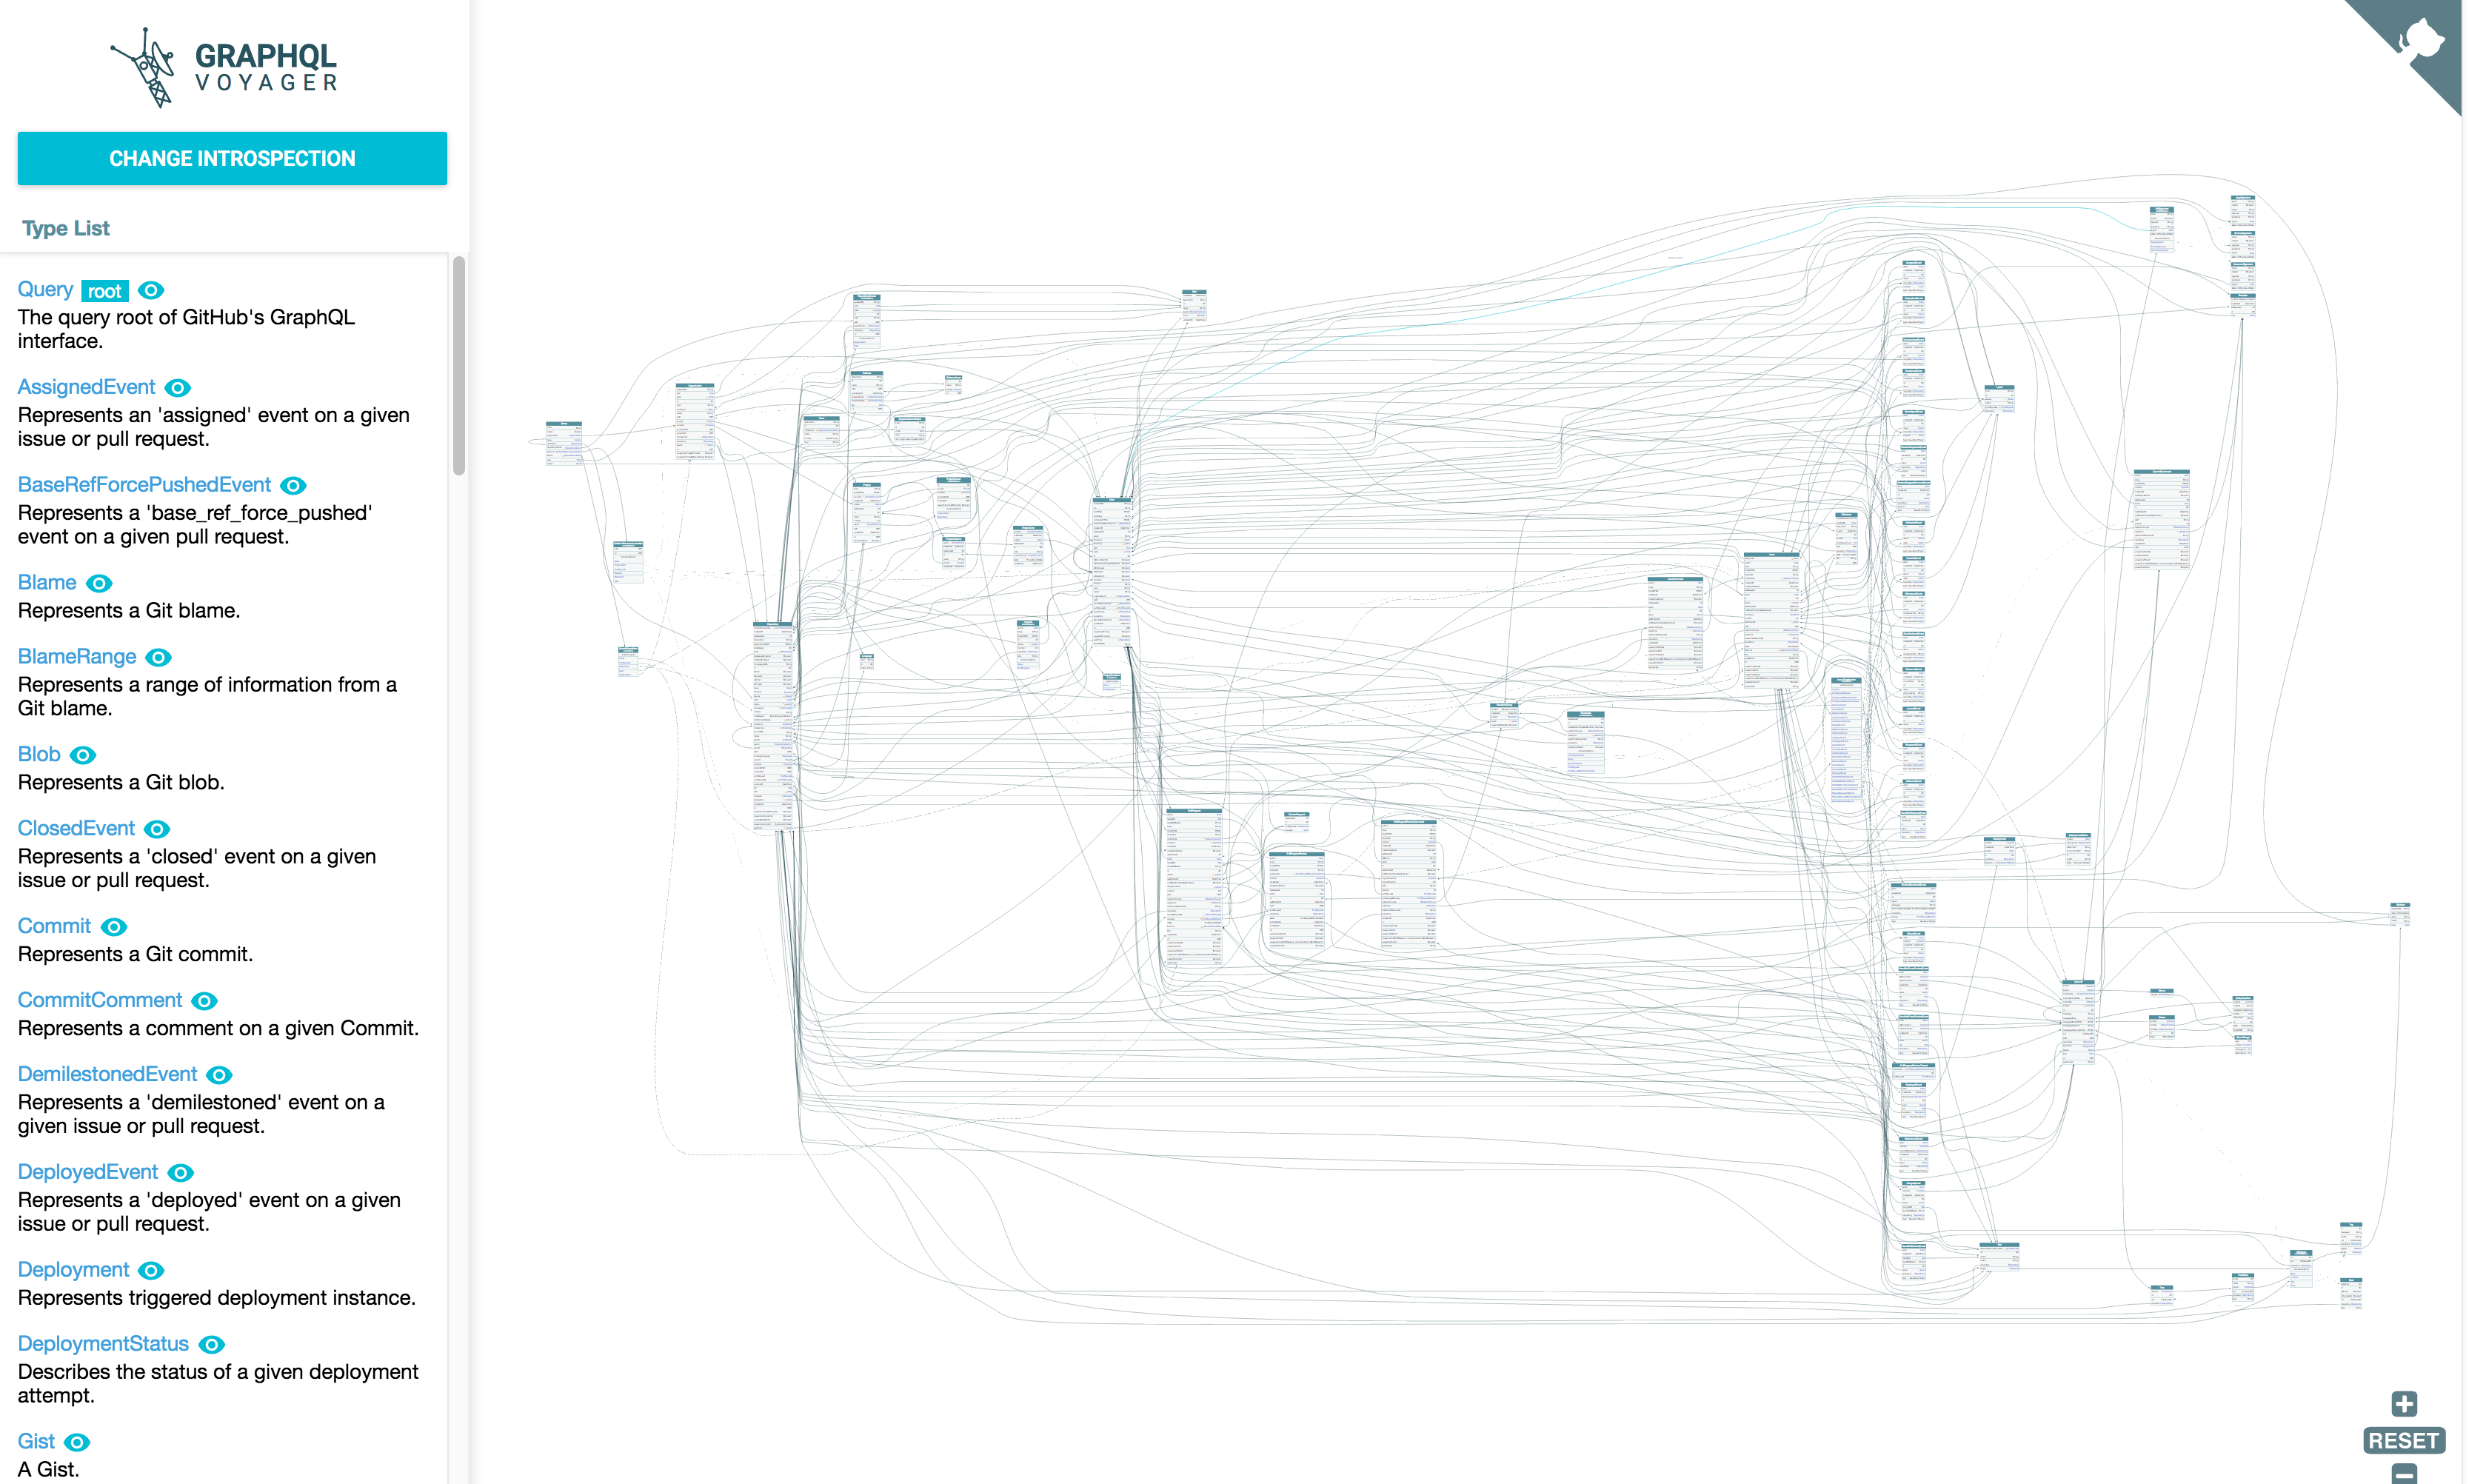 GraphQL Voyager vs the Github API